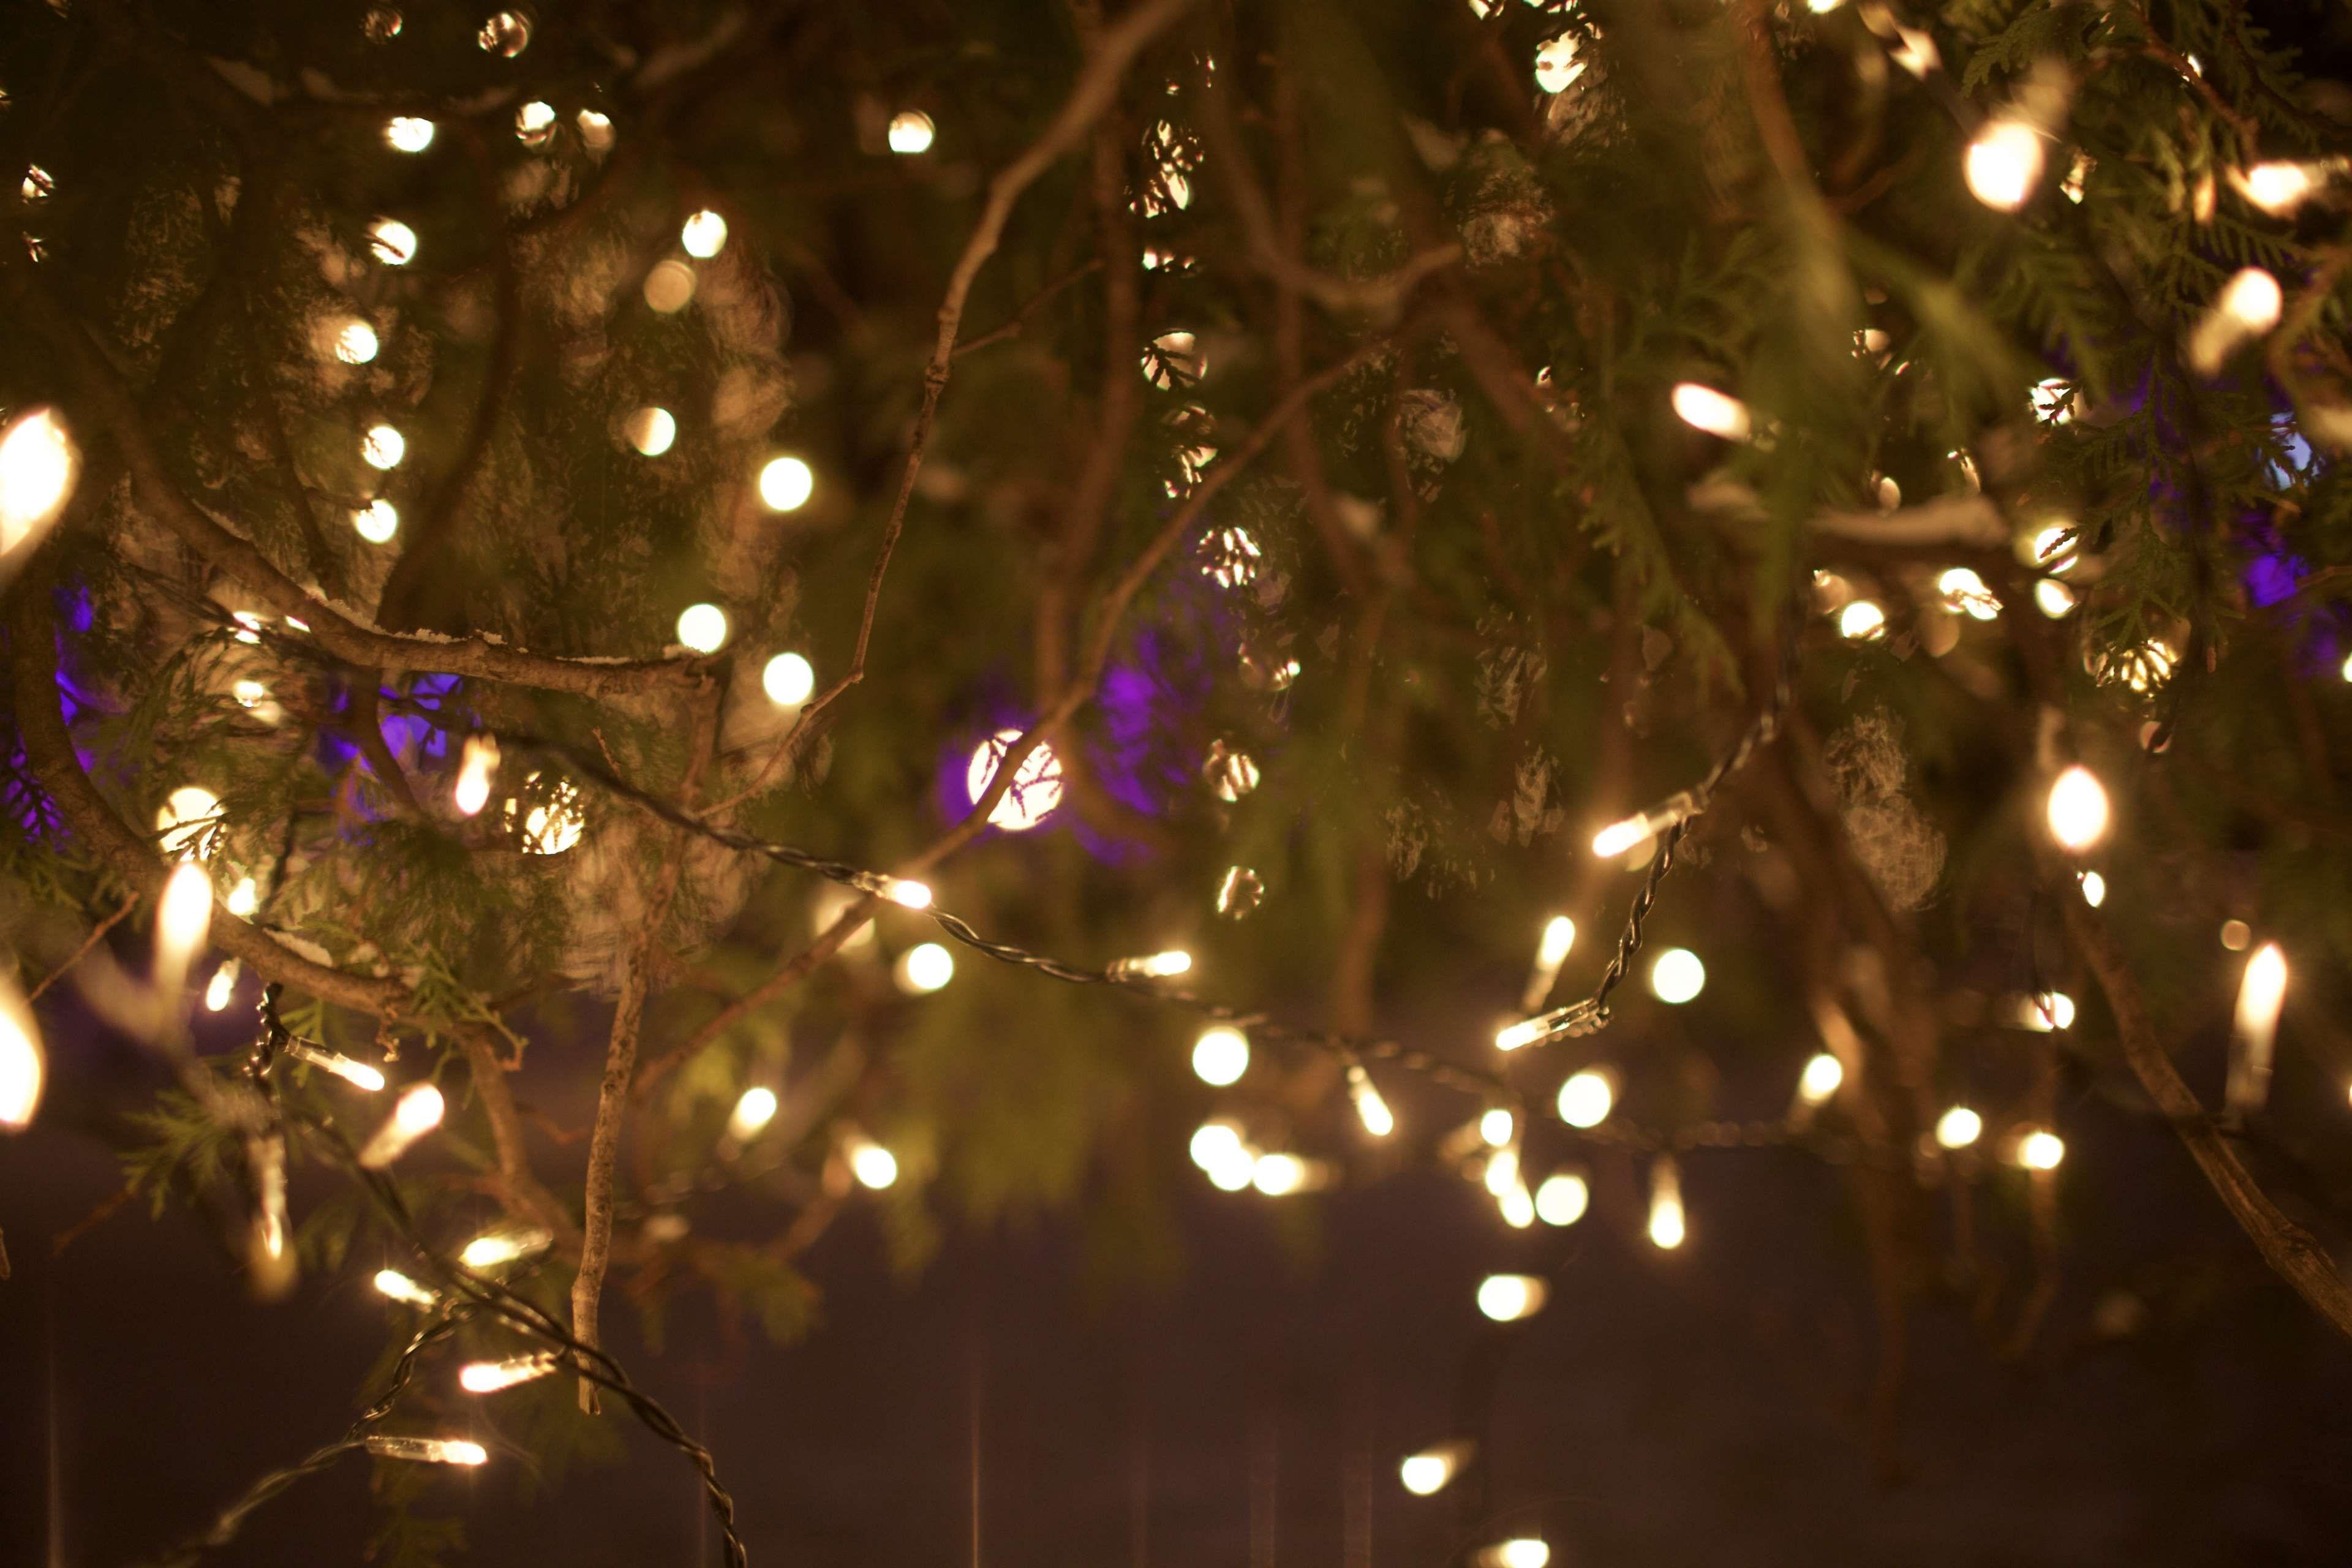 Wallpaper Images Hd Background Bokeh Christmas Decoration Lights Dark Deep